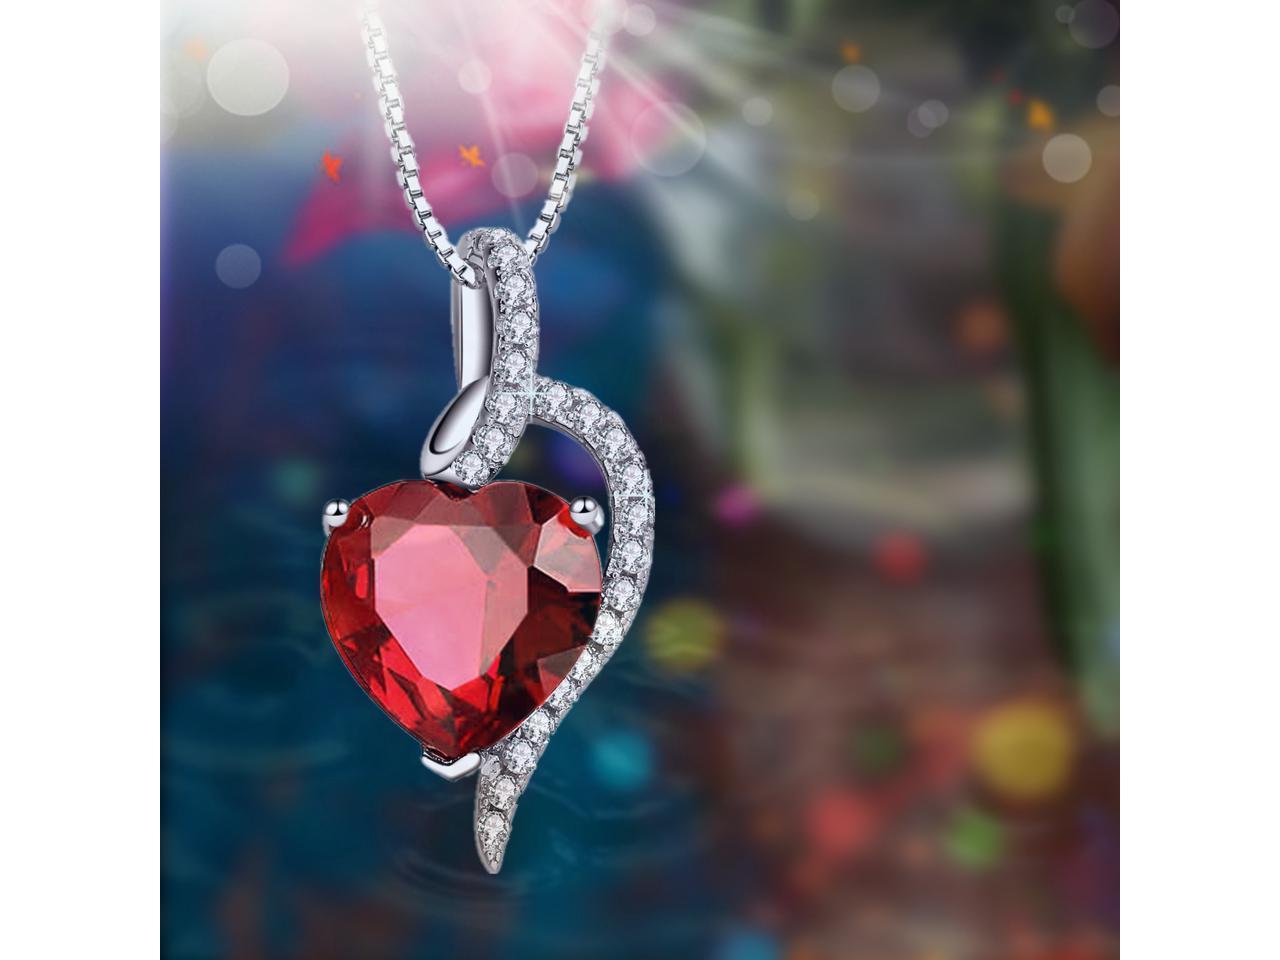 8mm Transparent Ruby Heart Bead #KHL005 12 Pcs